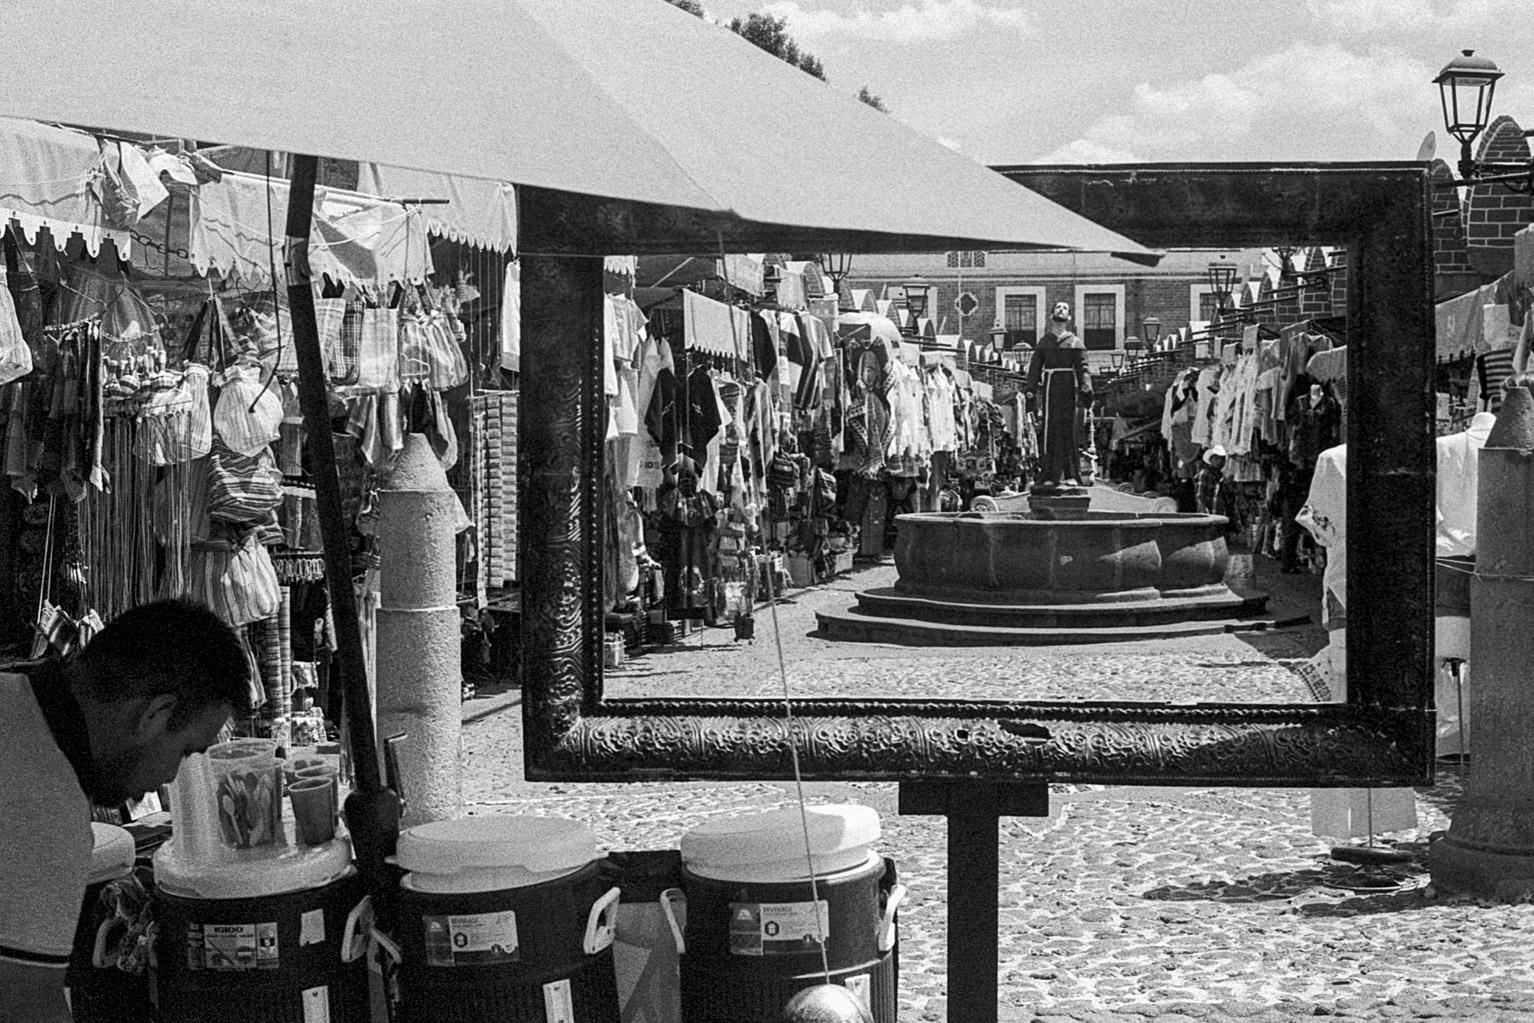 20190523_MexicoCIty_M5-KodakTrix400_024-Edit.jpg